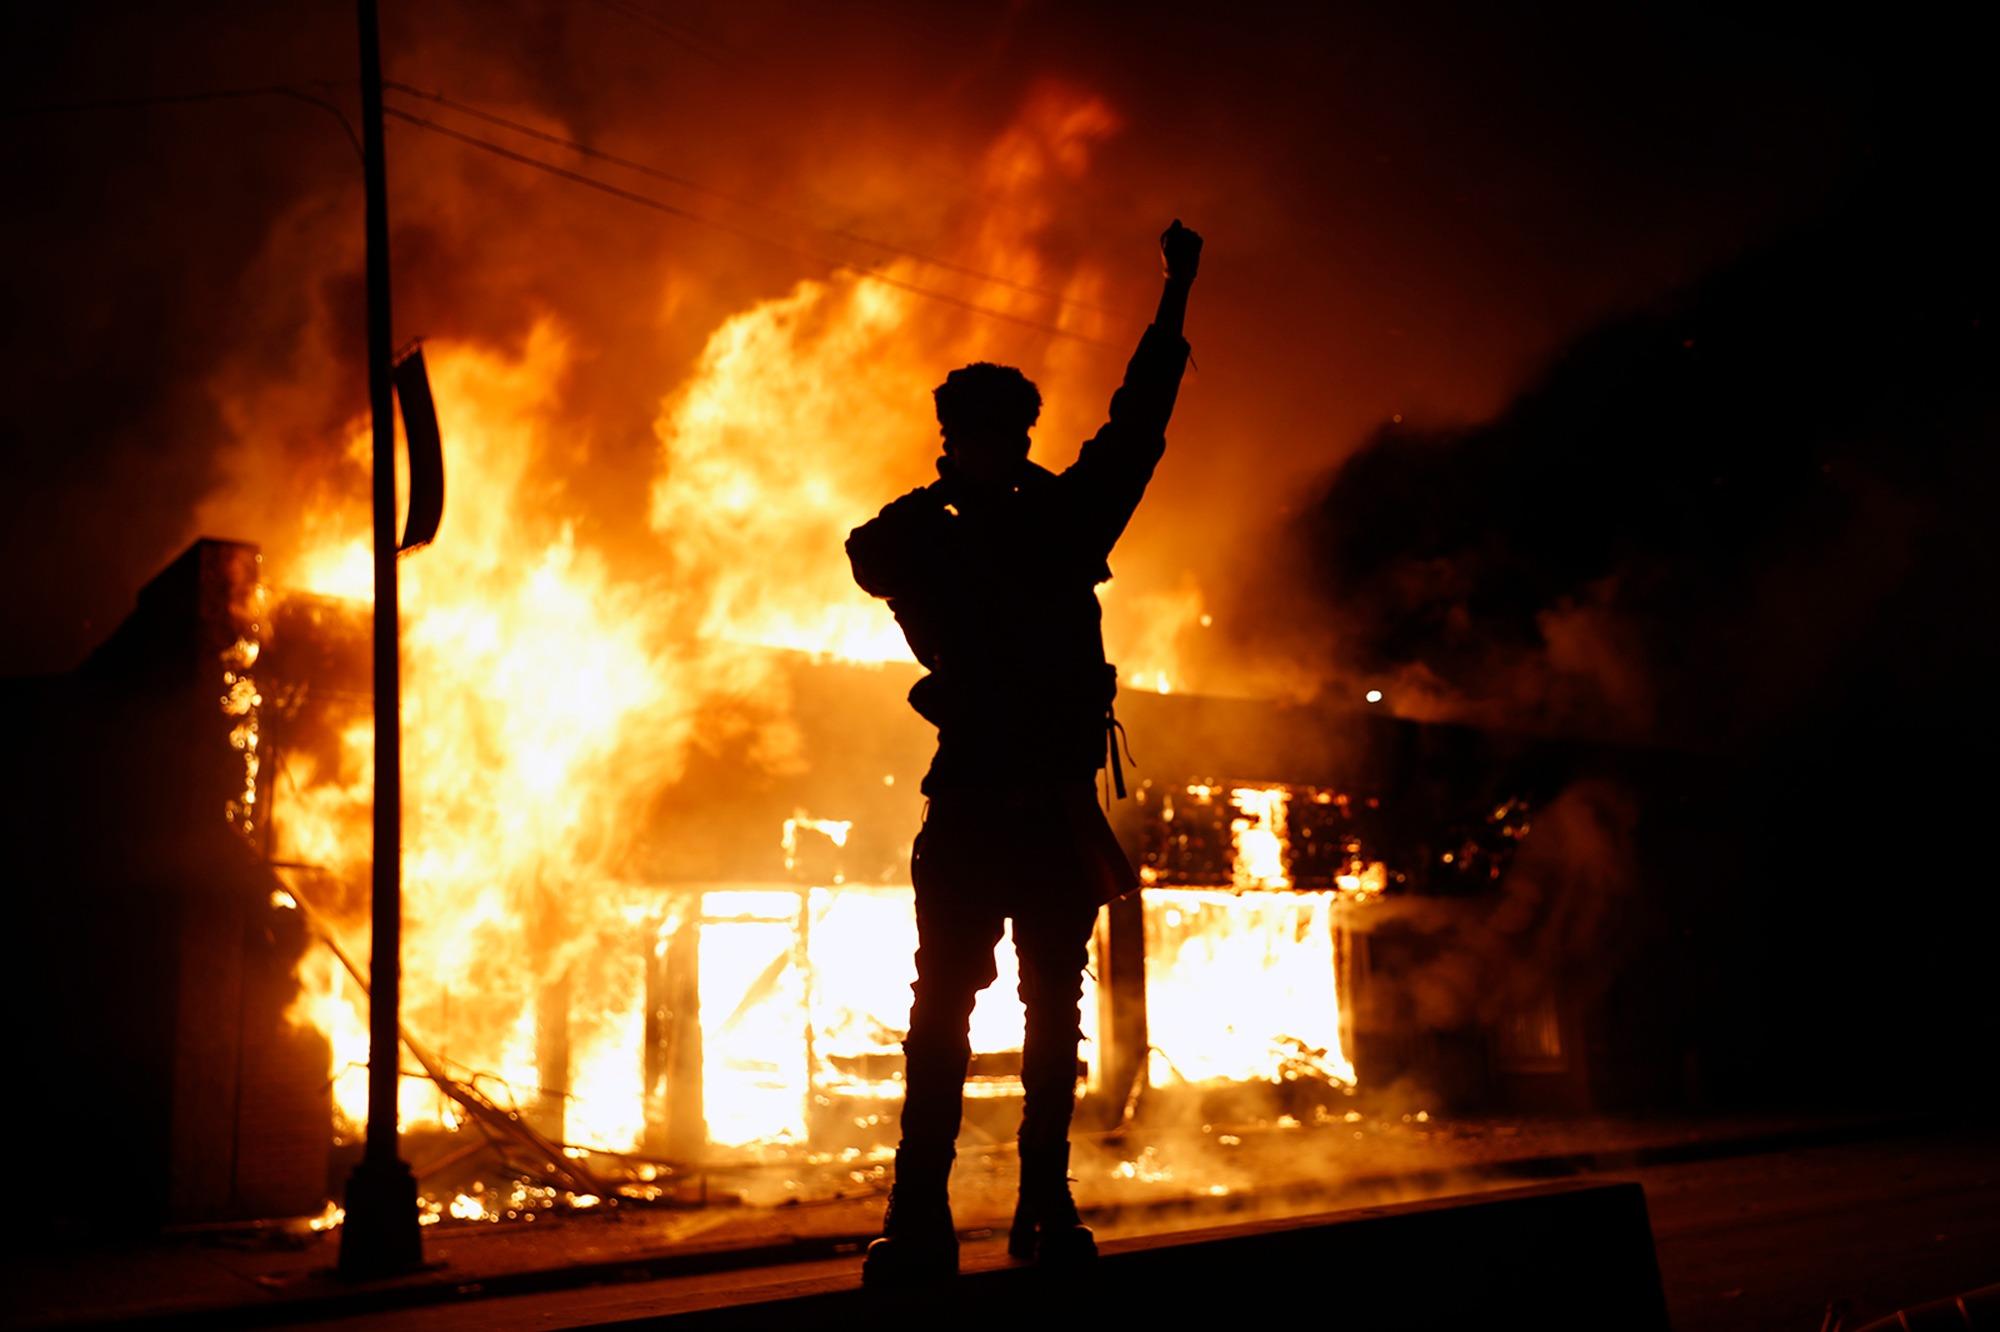 【ftx】_明尼阿波利斯骚乱50人被捕 国民警卫队将派1700名士兵维持秩序